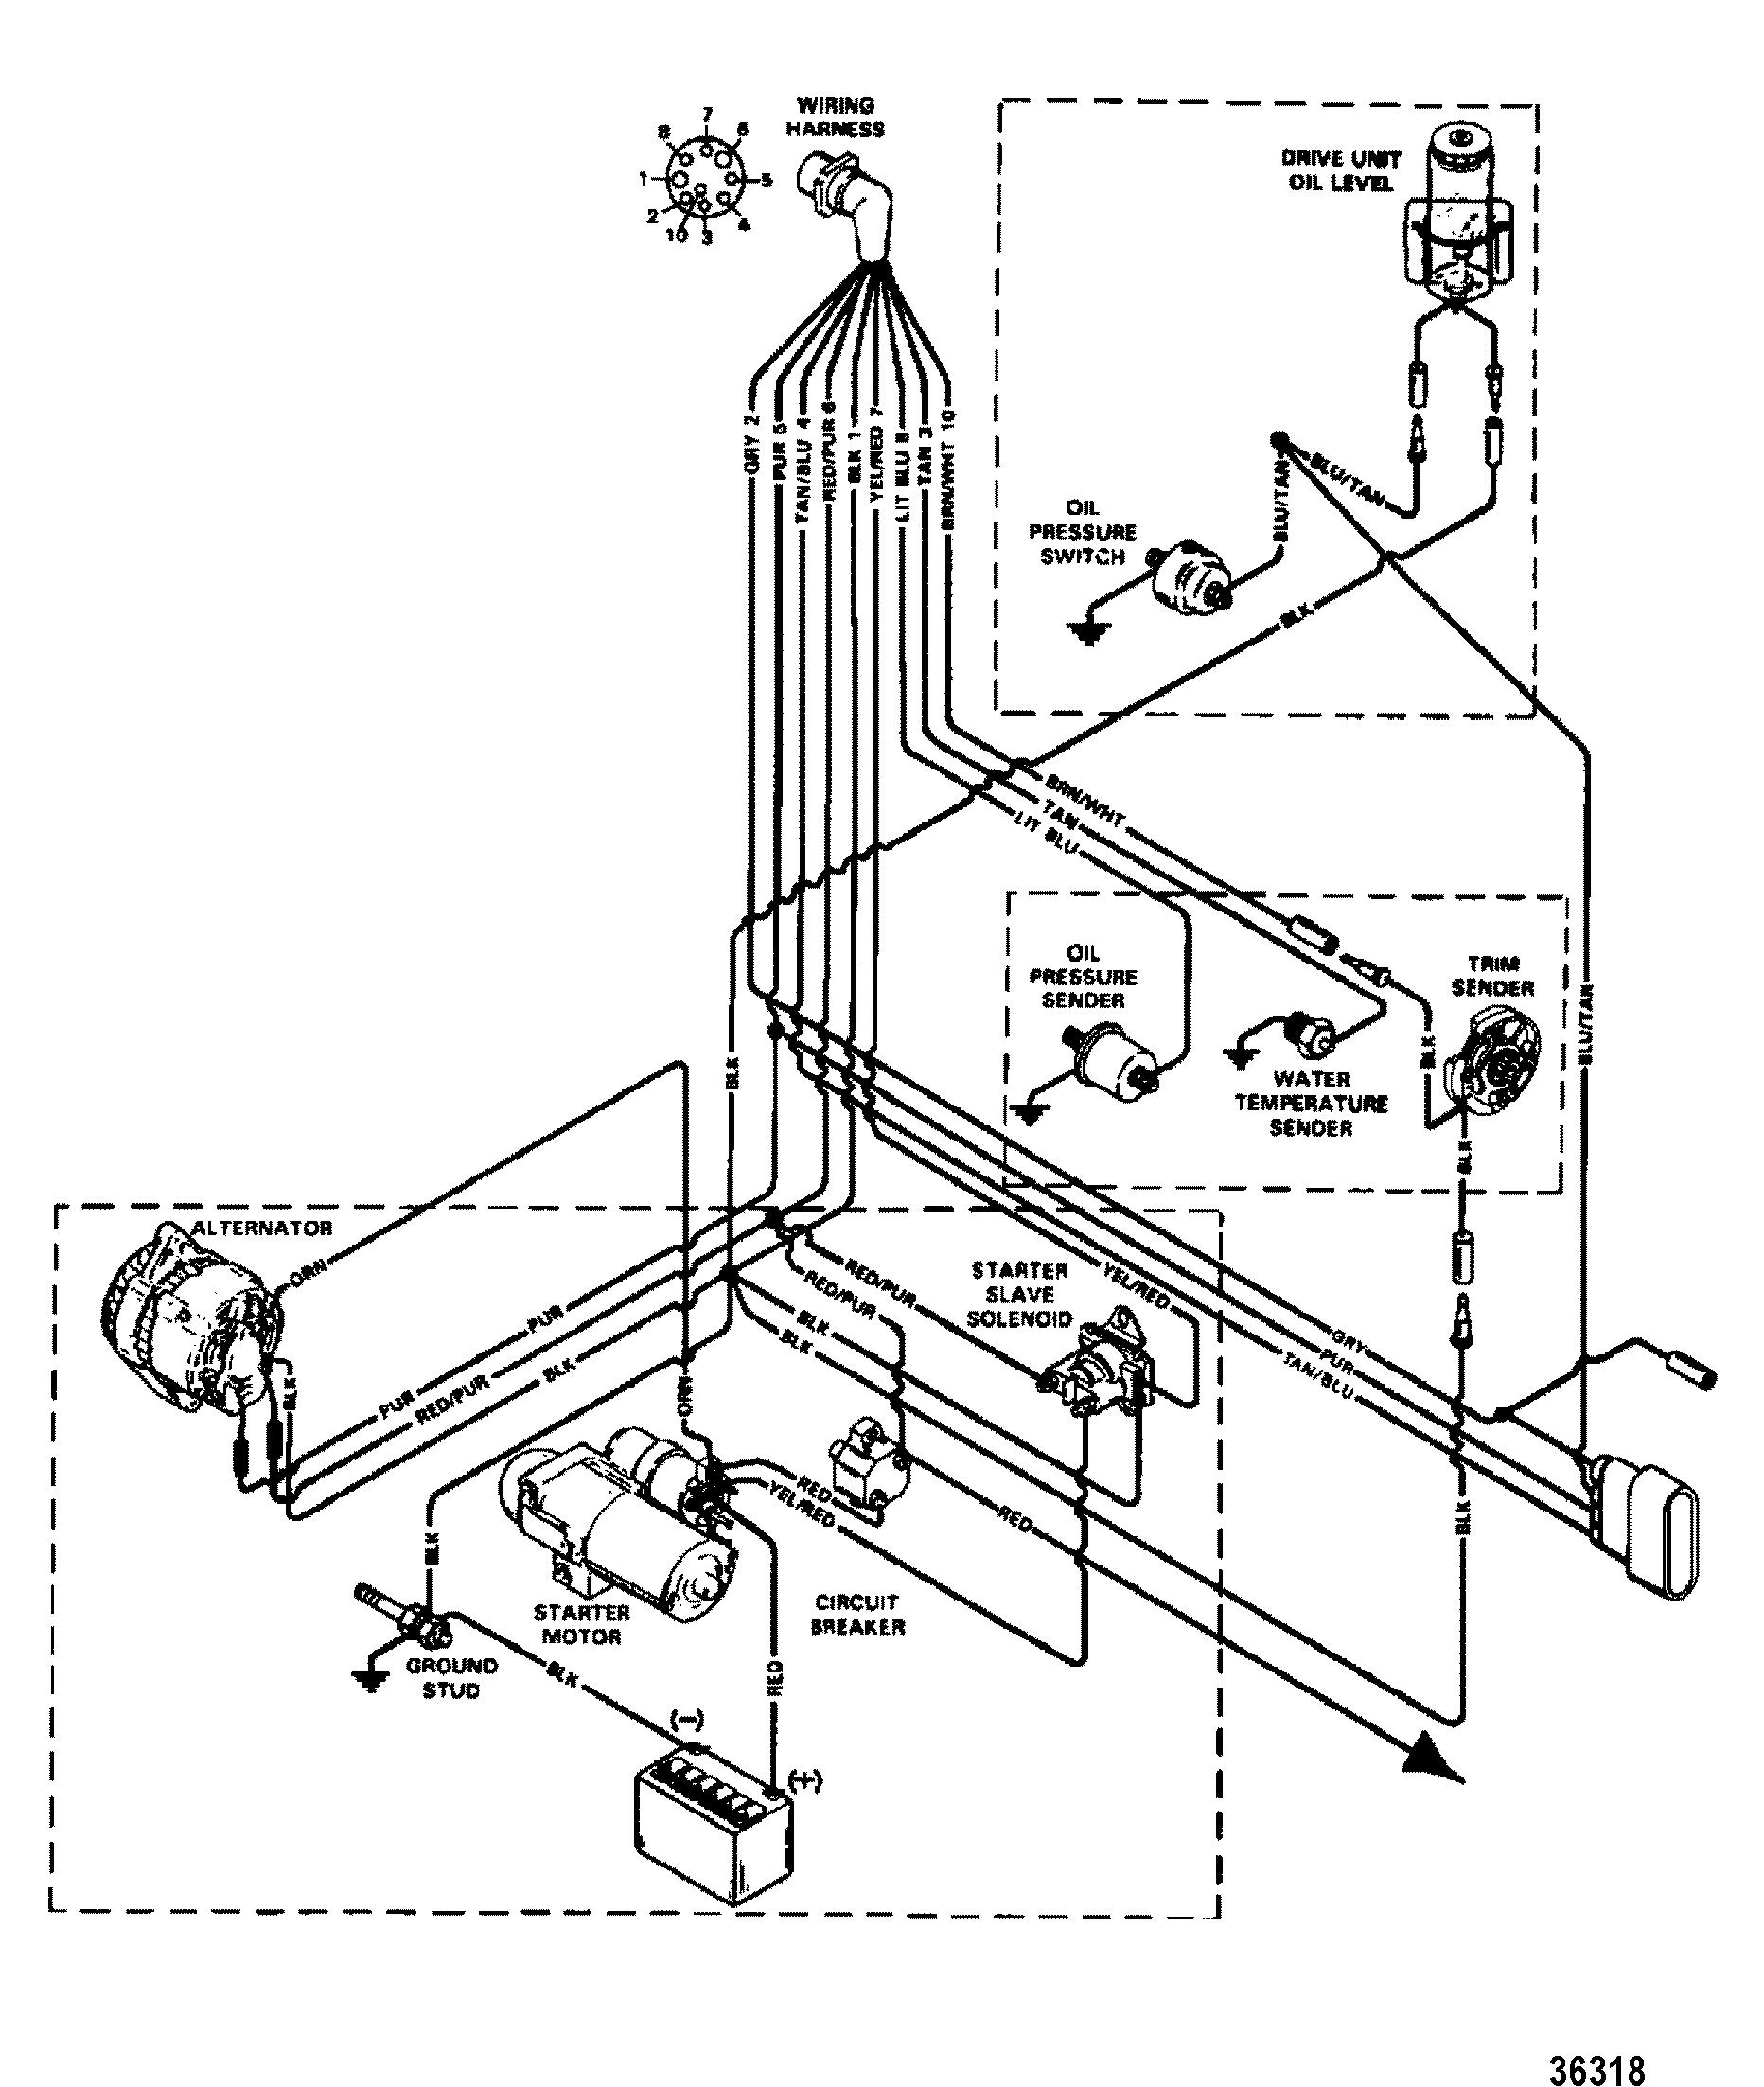 hight resolution of mercruiser engine wiring diagram wiring diagram origin rh 6 2 3 darklifezine de mercruiser 350 mag mpi diagram digital throttle 2006 mercruiser 350 mag mpi